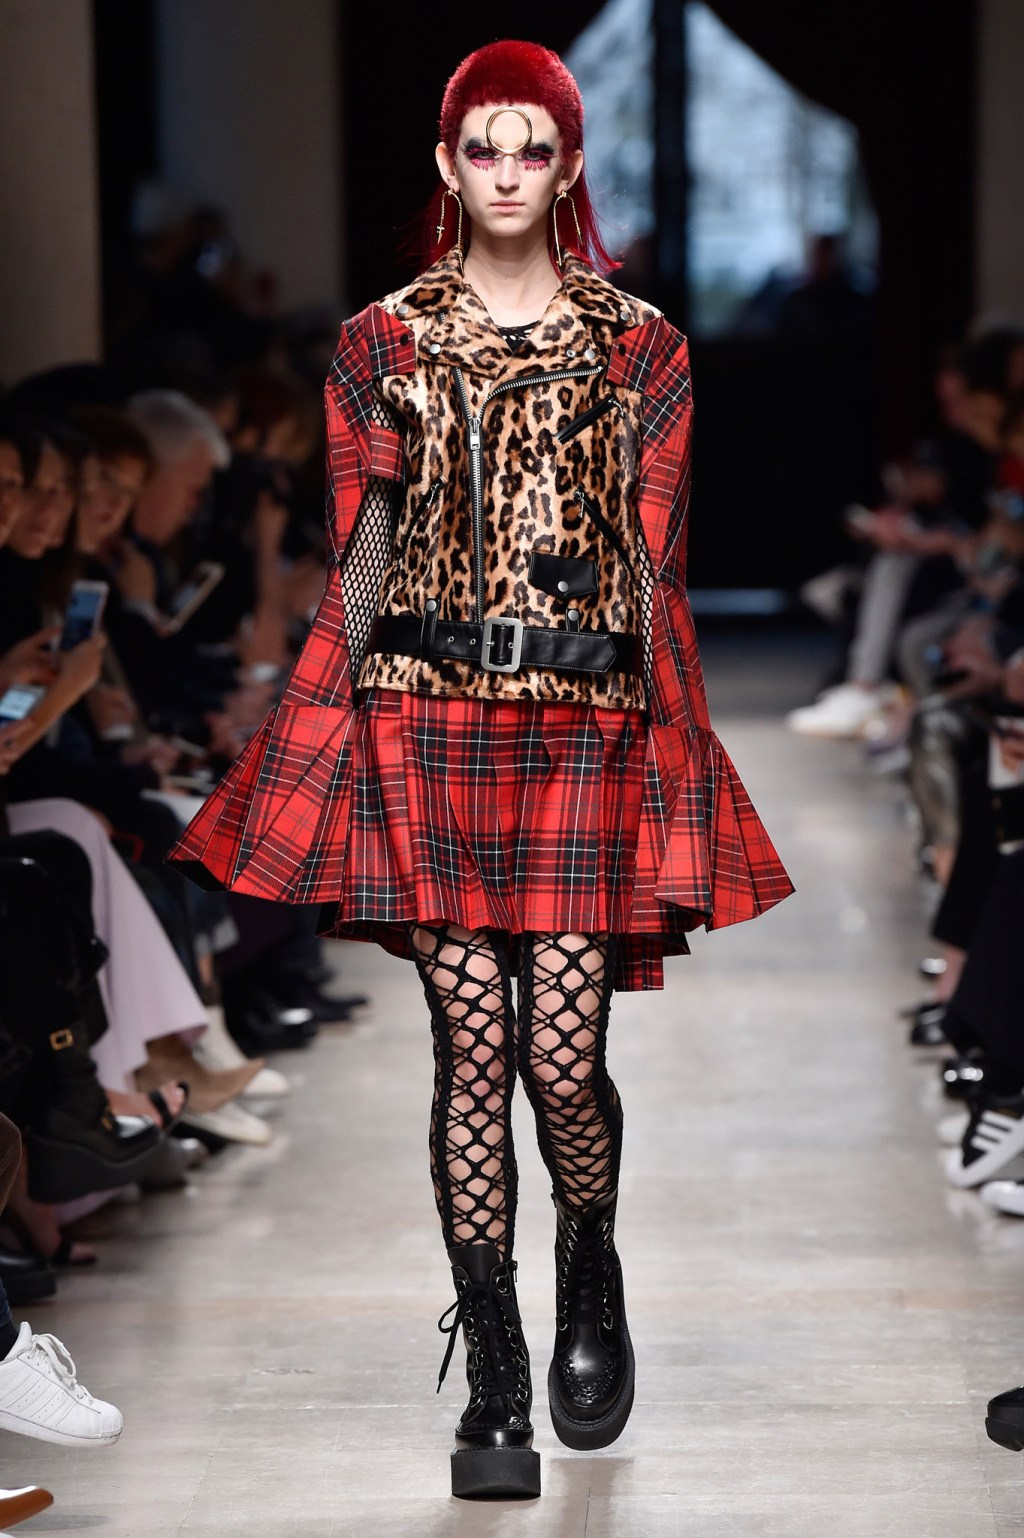 f2f0f6f57 How To Do Street Style Punk - Phunky Punk Fashion